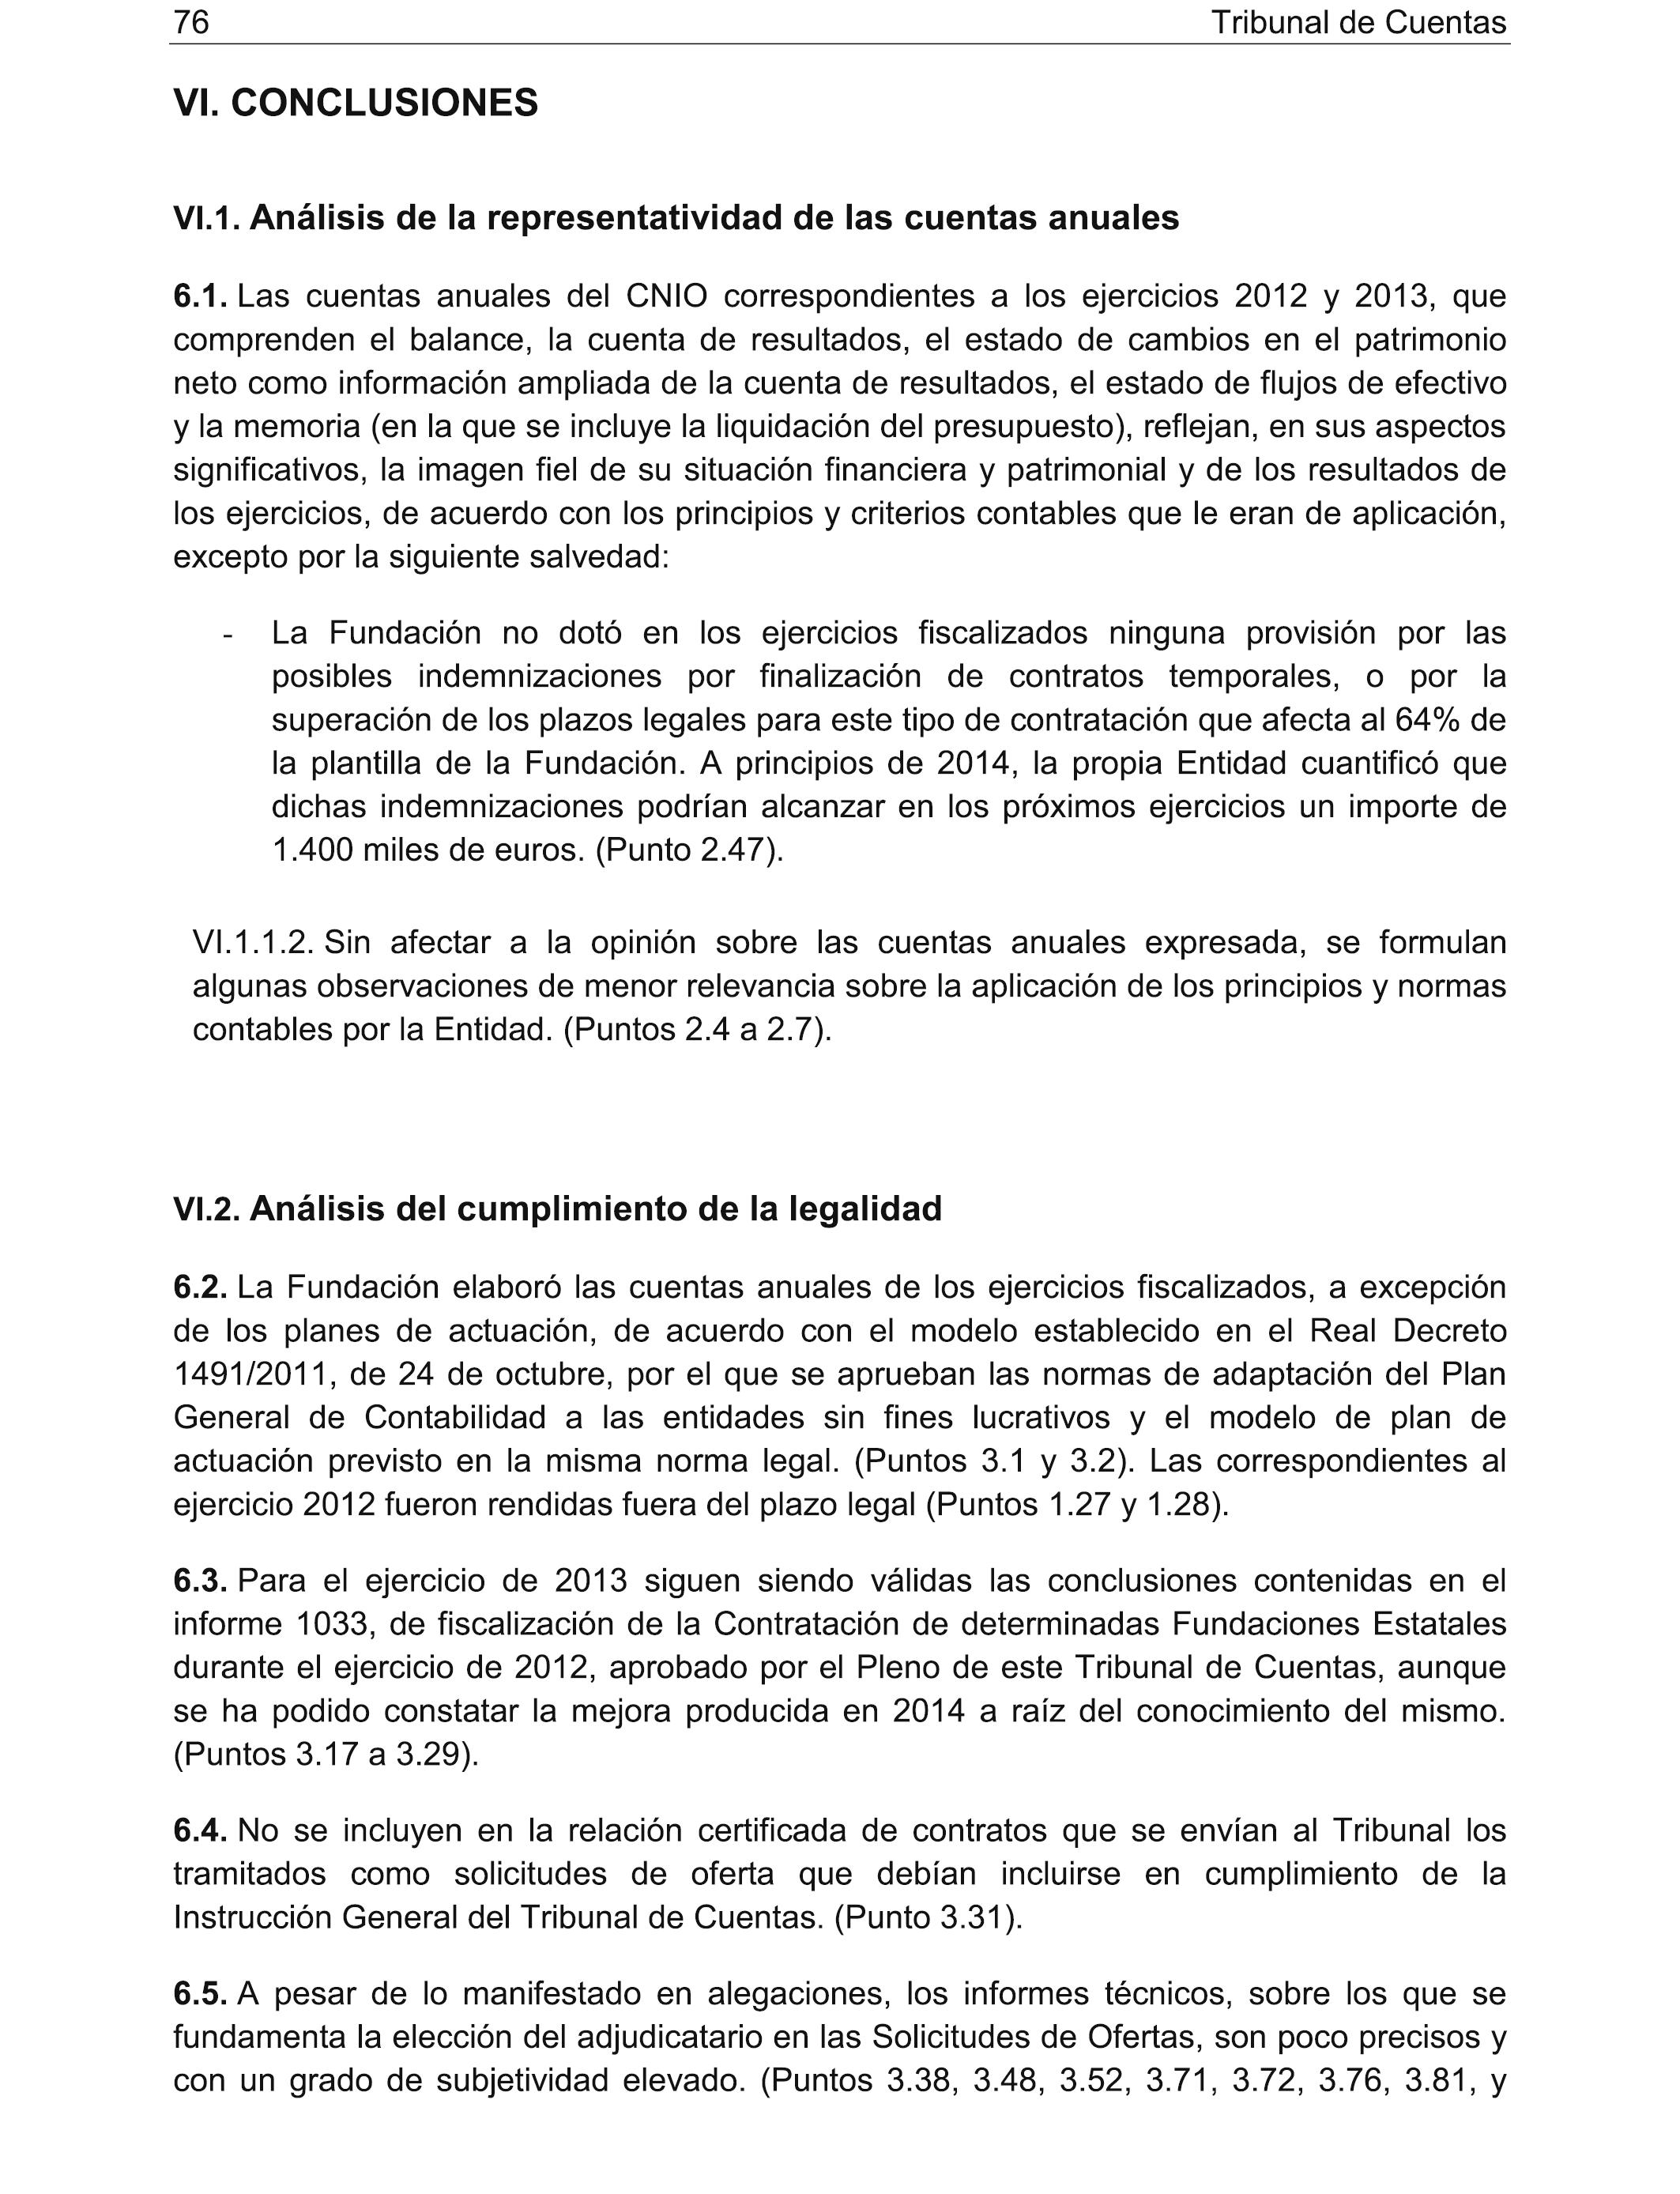 BOE.es - Documento BOE-A-2017-3383